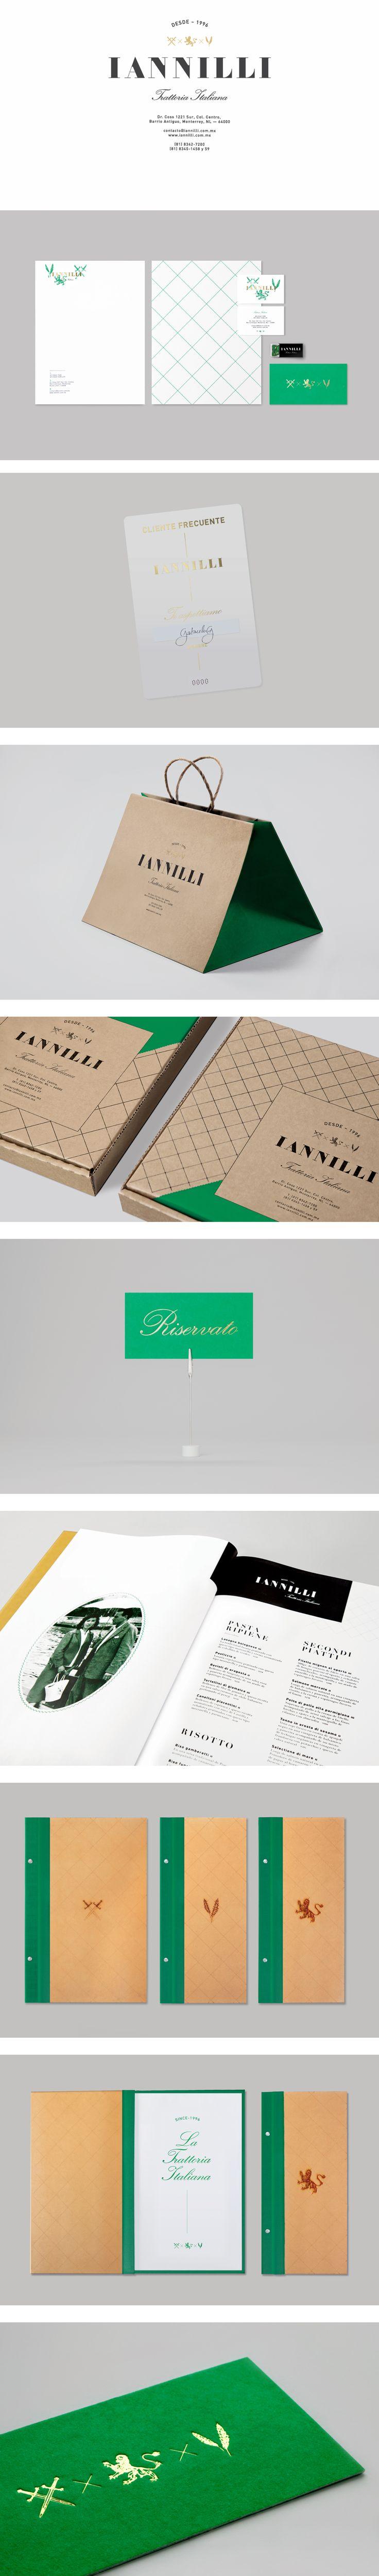 IANNILLI   Saavy Studio #packaging #branding #marketing PD